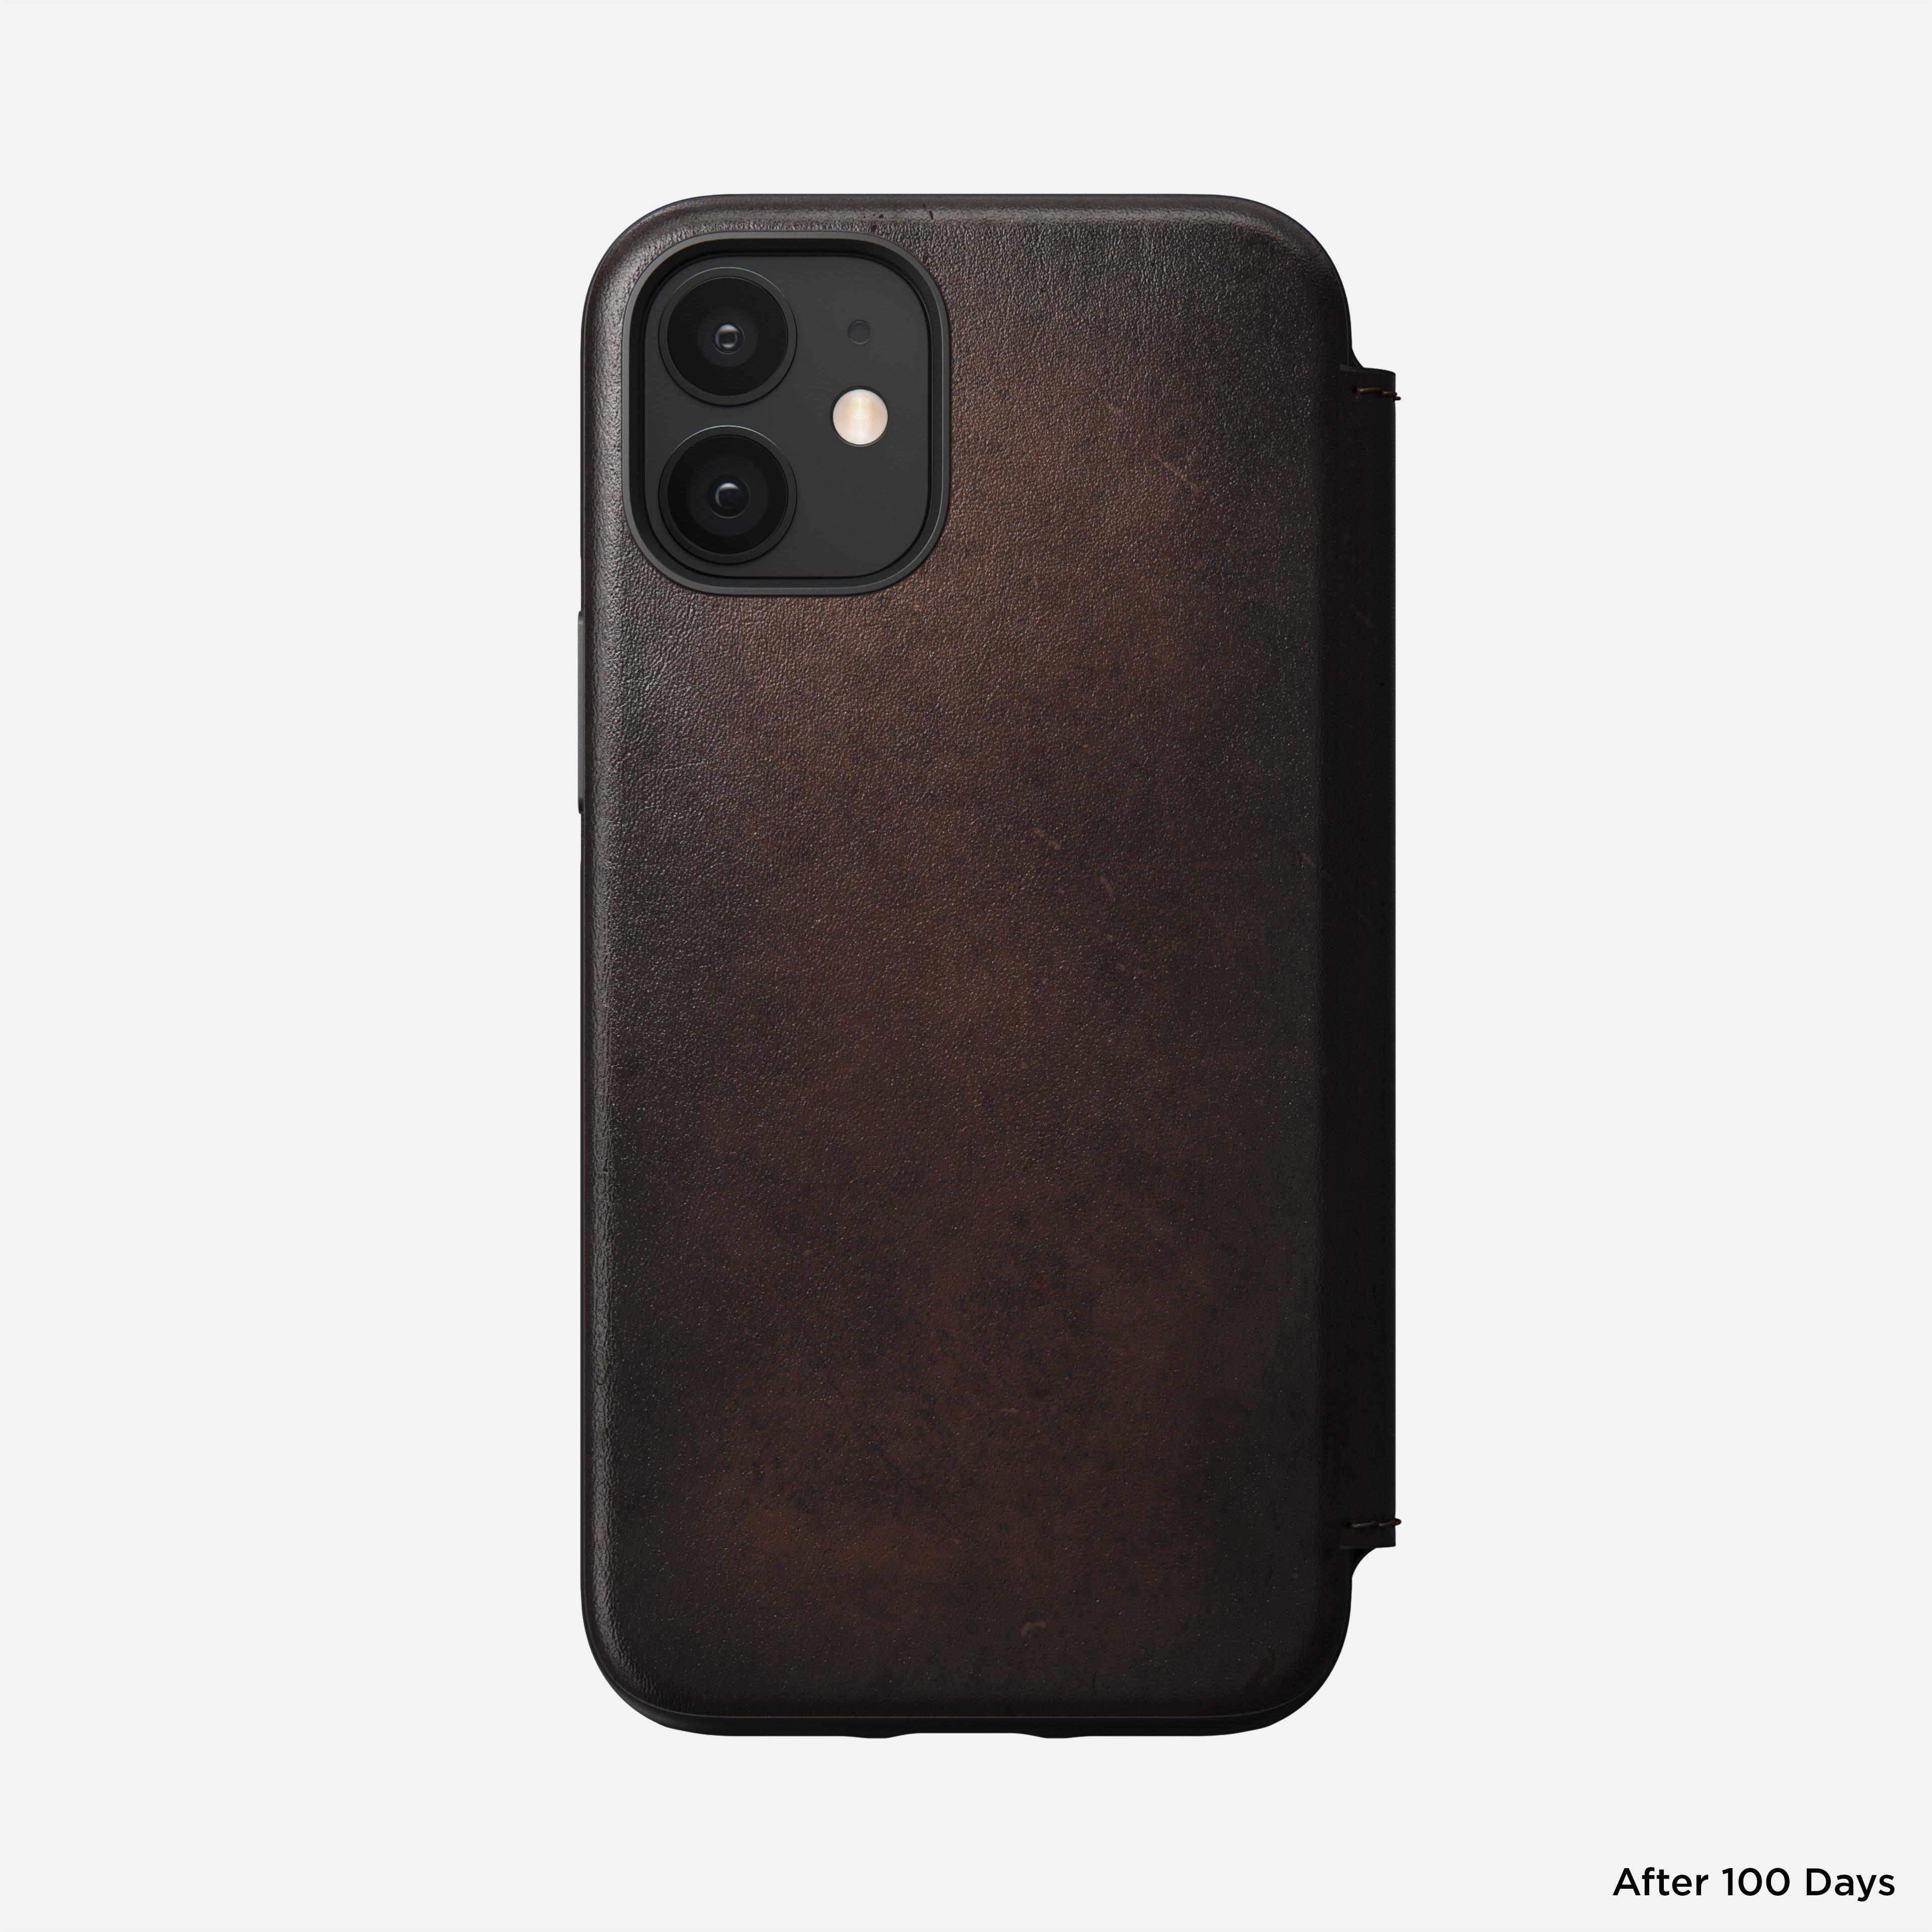 Rugged folio horween leather rustic brown iphone 12 mini